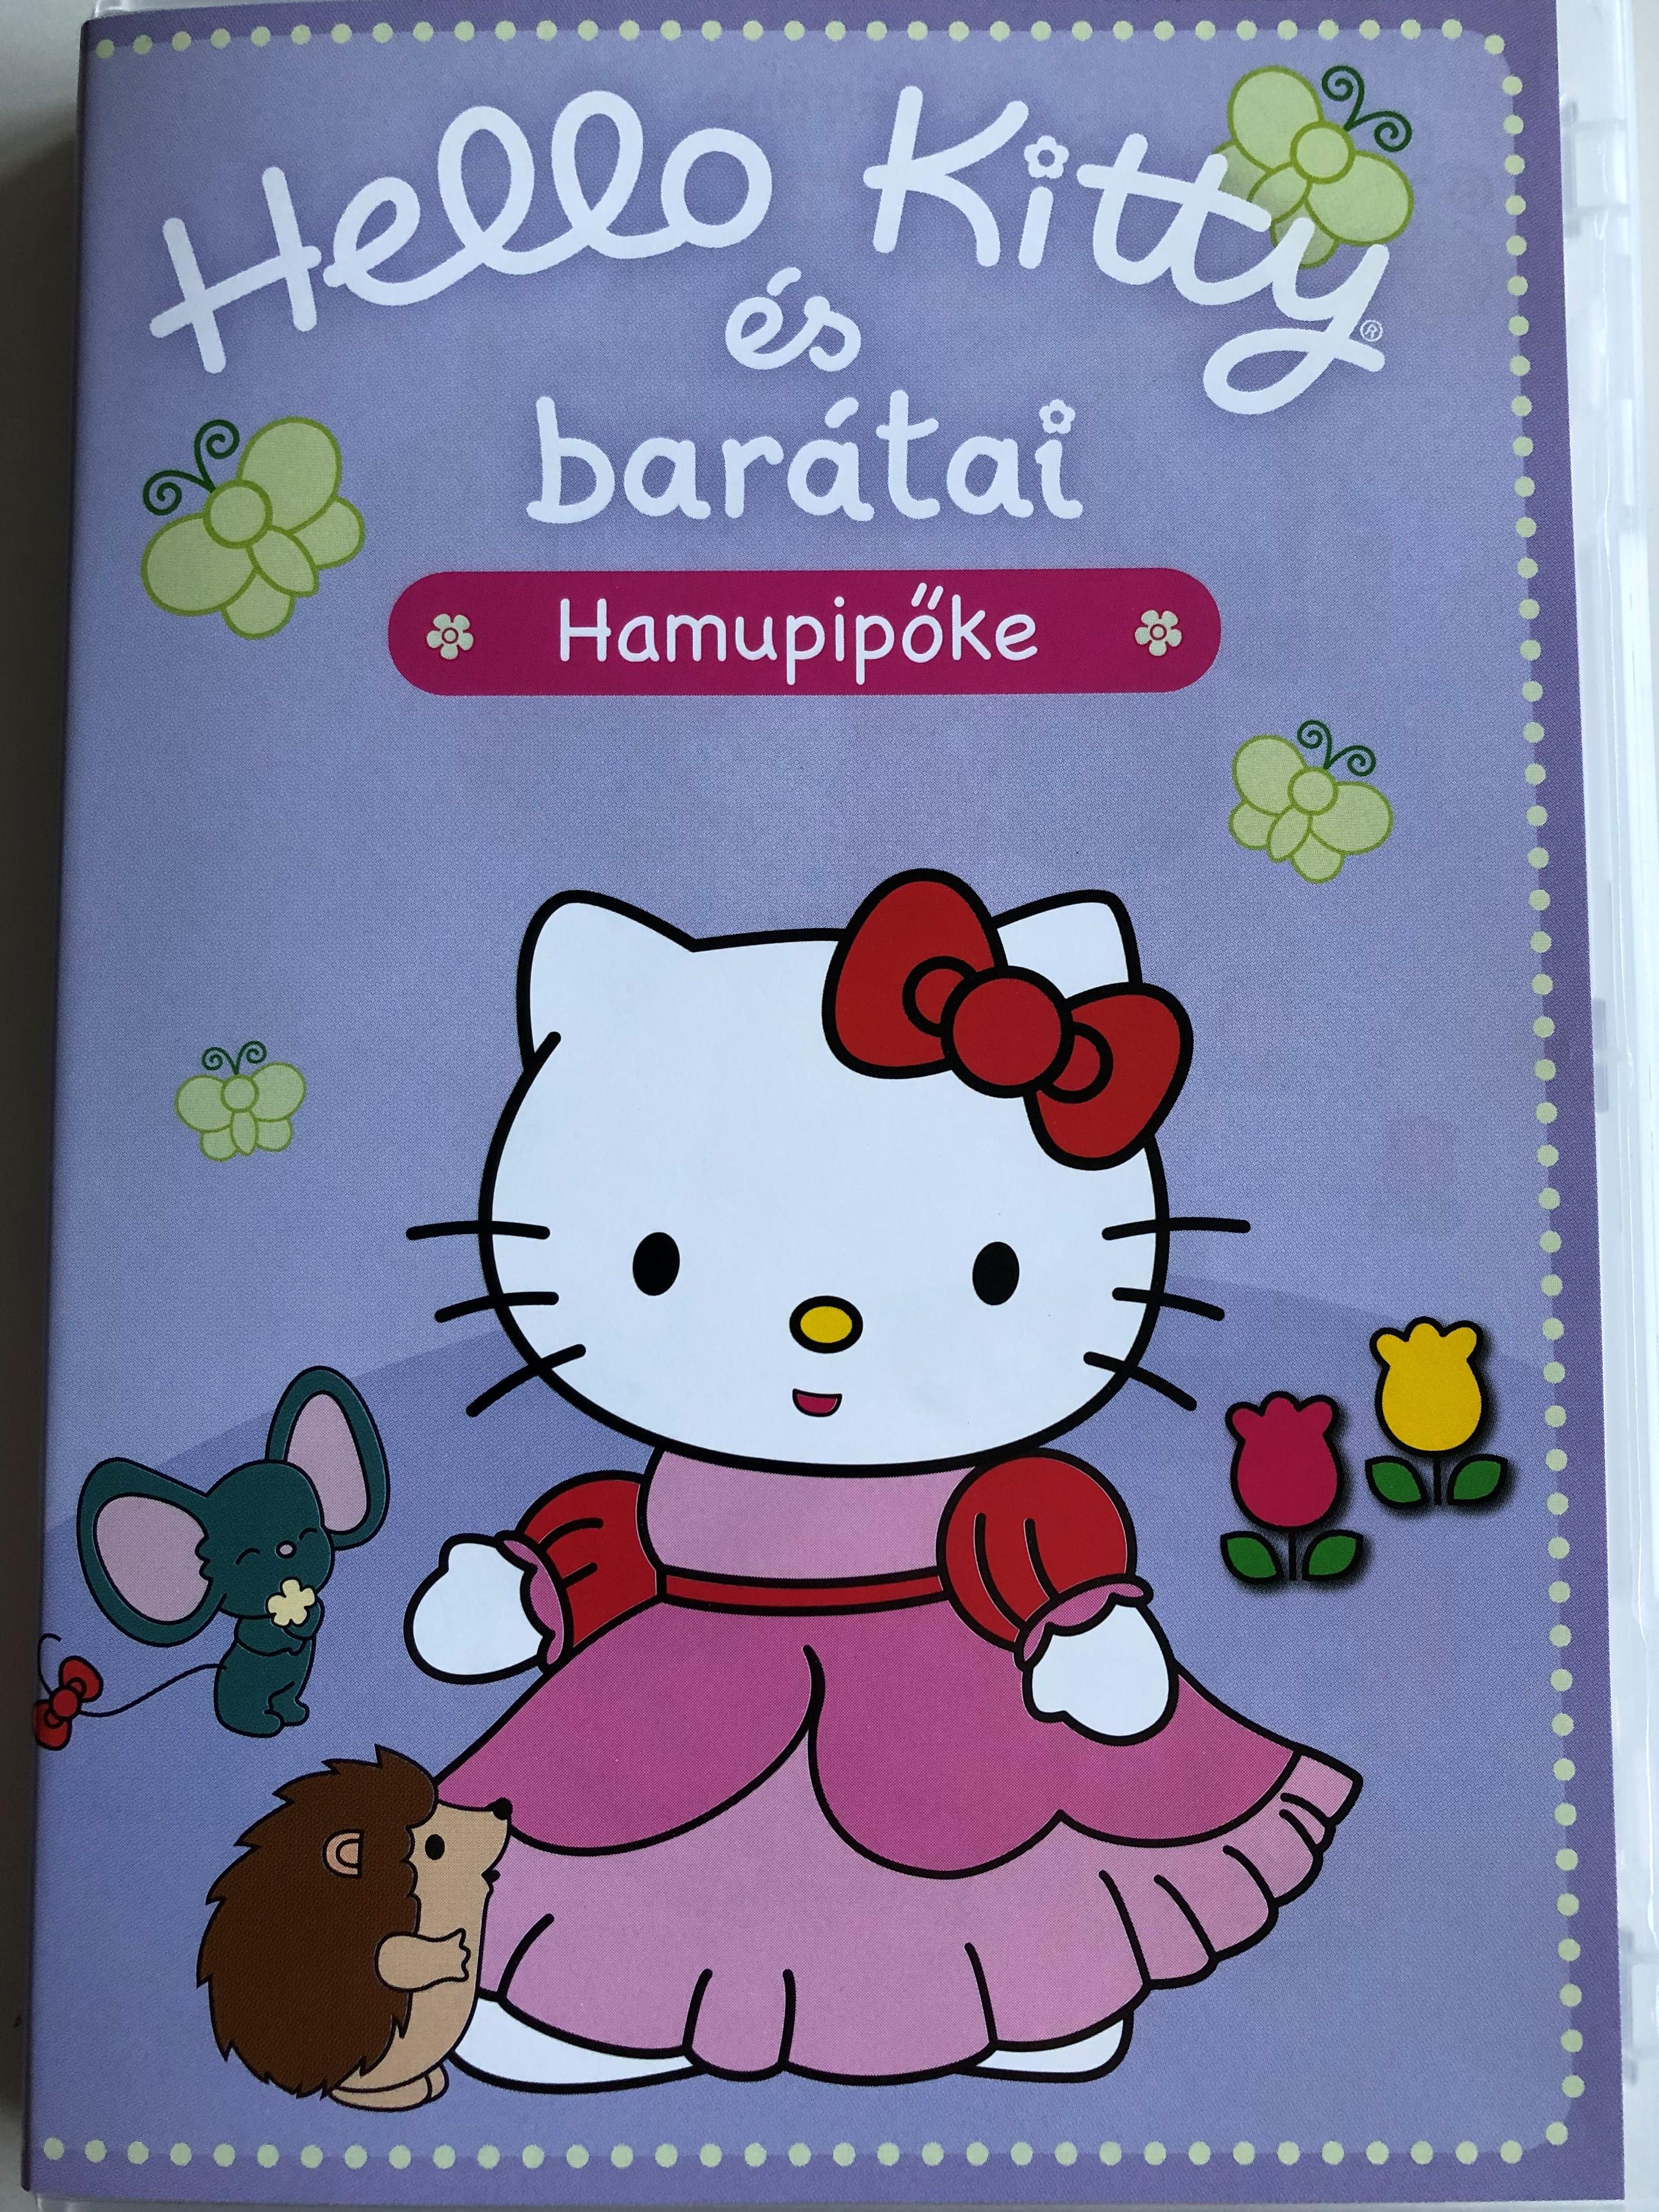 hello-kitty-s-bar-tai-hamupi-ke-dvd-2-epiz-d-2-episodes-on-disc-1-.jpg